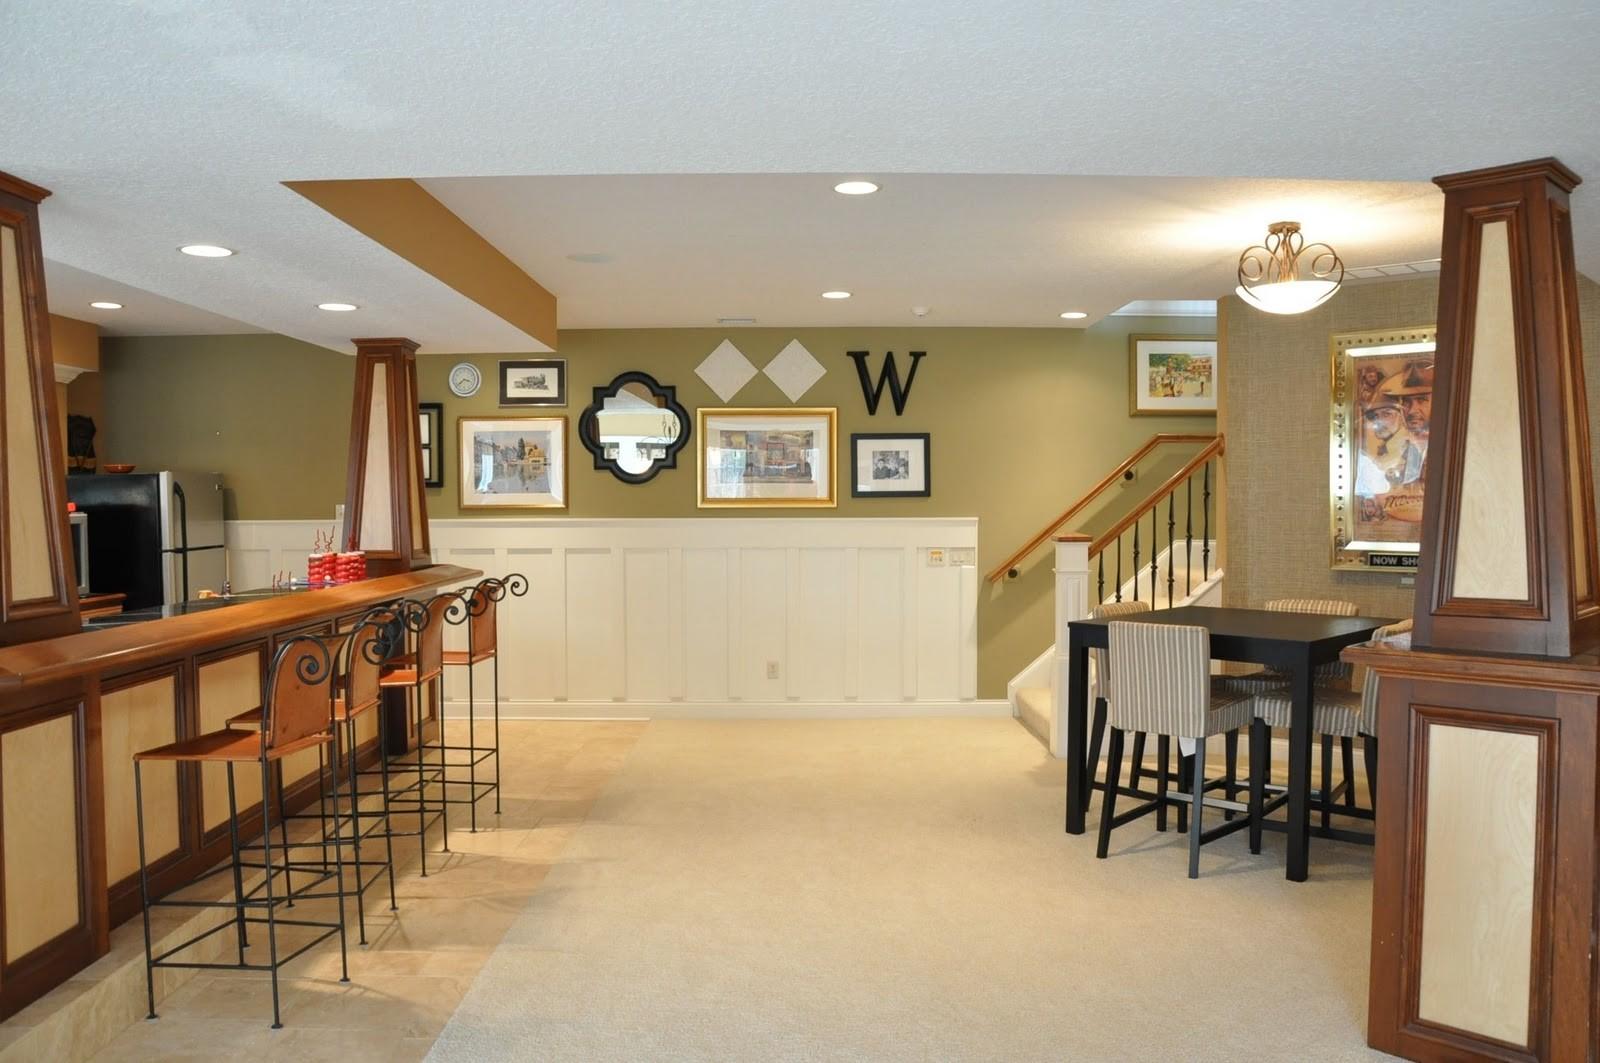 Great basement paint colors tdf blog - 7 great basement design ideas ...